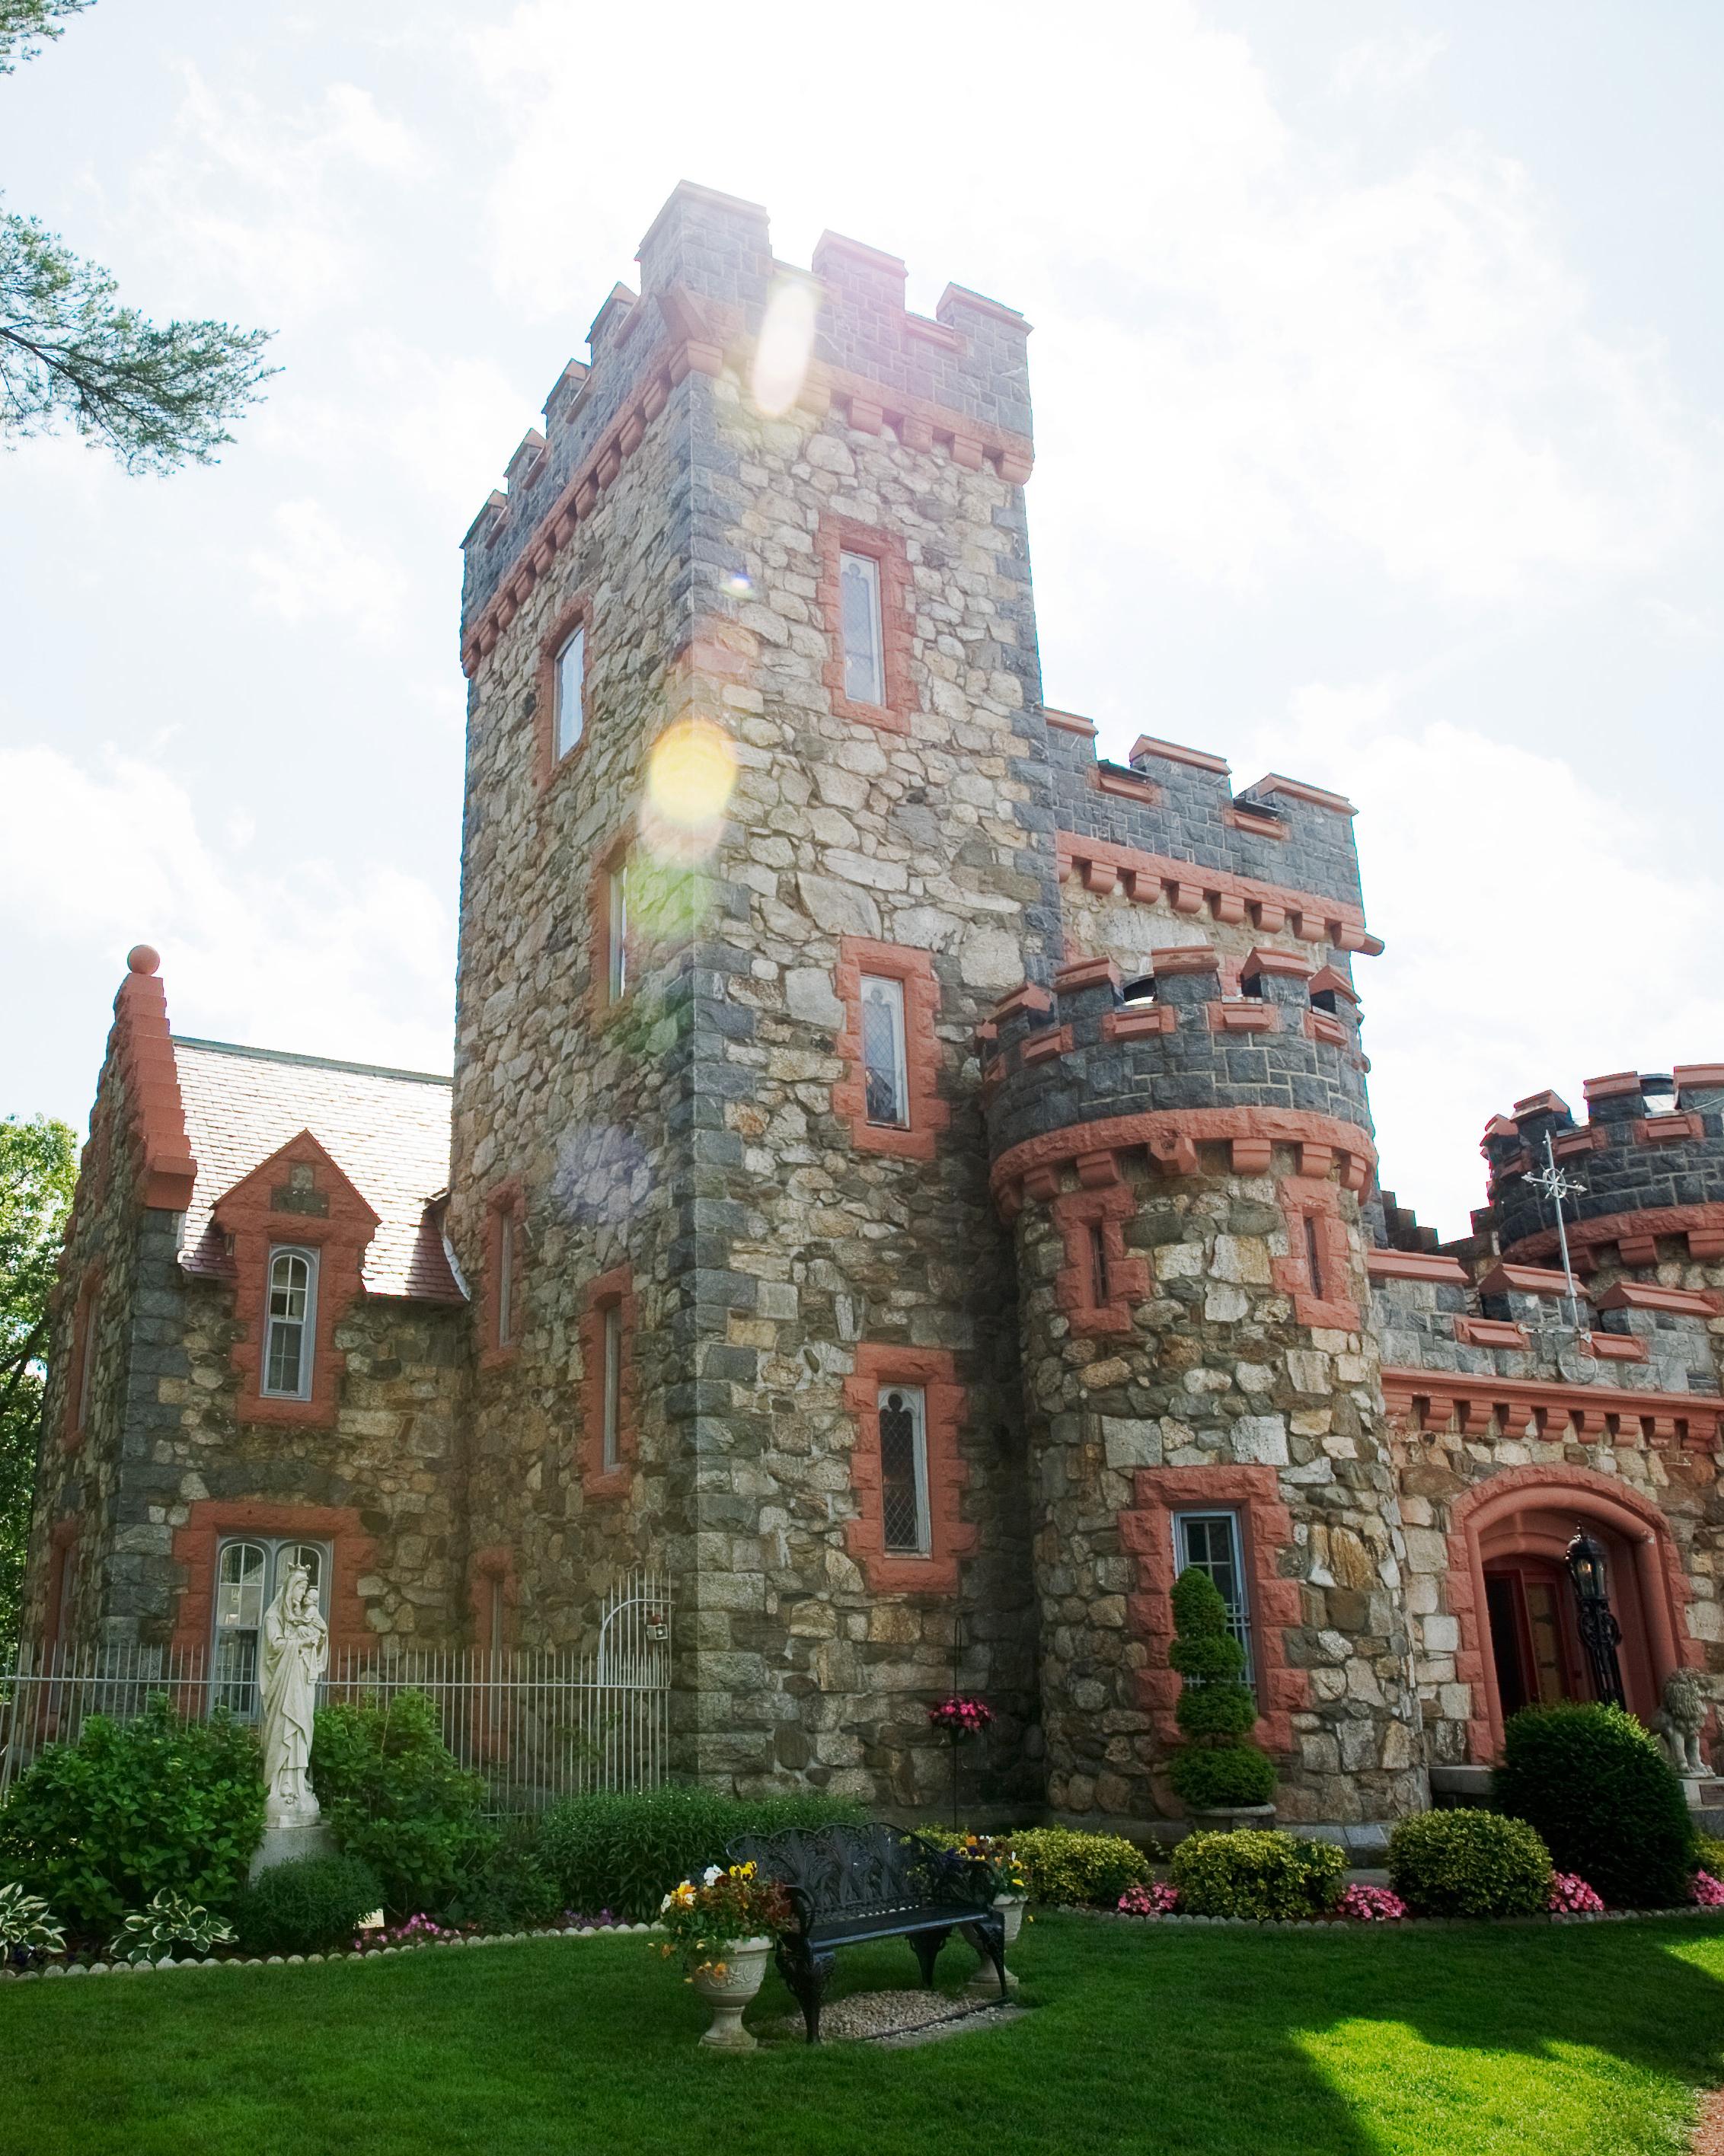 castle-wedding-venues-searles-new-hampshire-0115.jpg